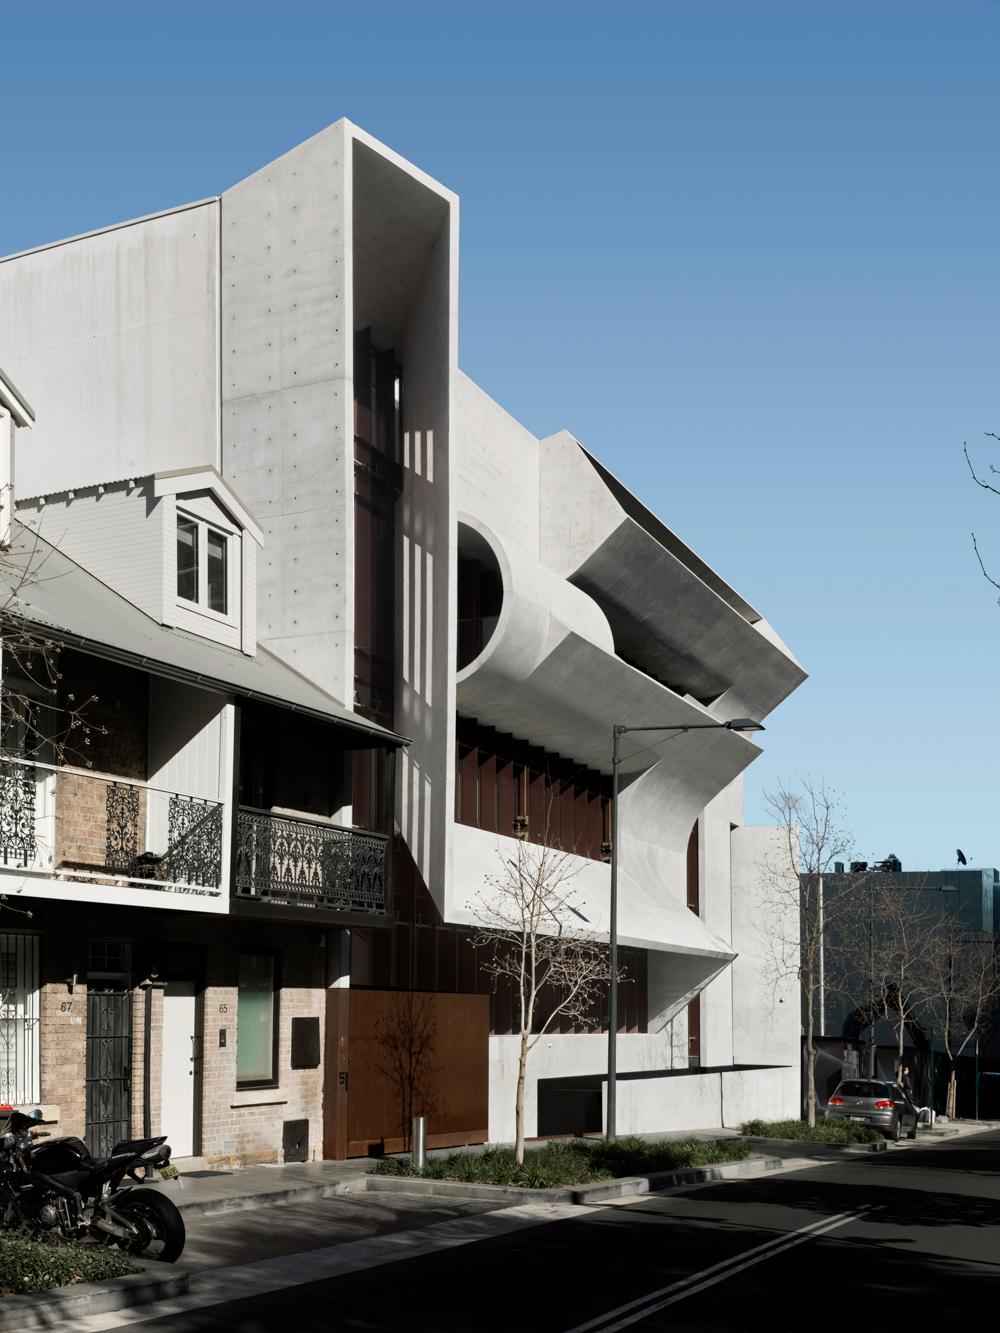 indigo-slam-smart-design-studio-sydney-architecture-the-design-emotive-07.jpg